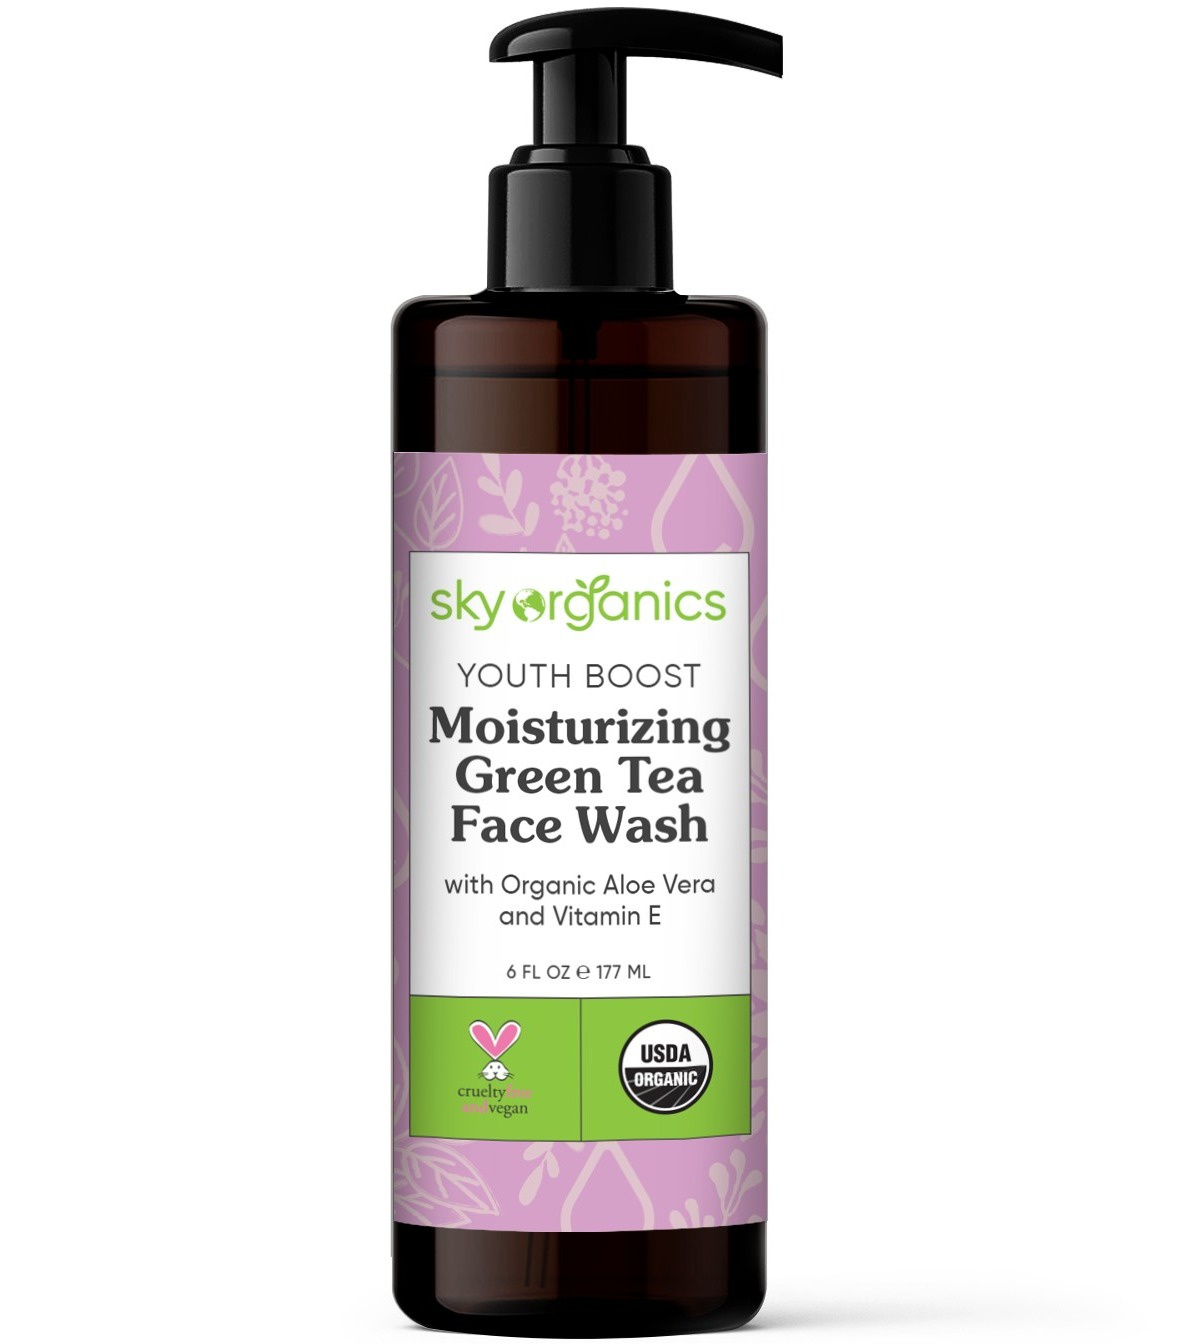 Sky Organics Youth Boost, Moisturizing Green Tea Face Wash